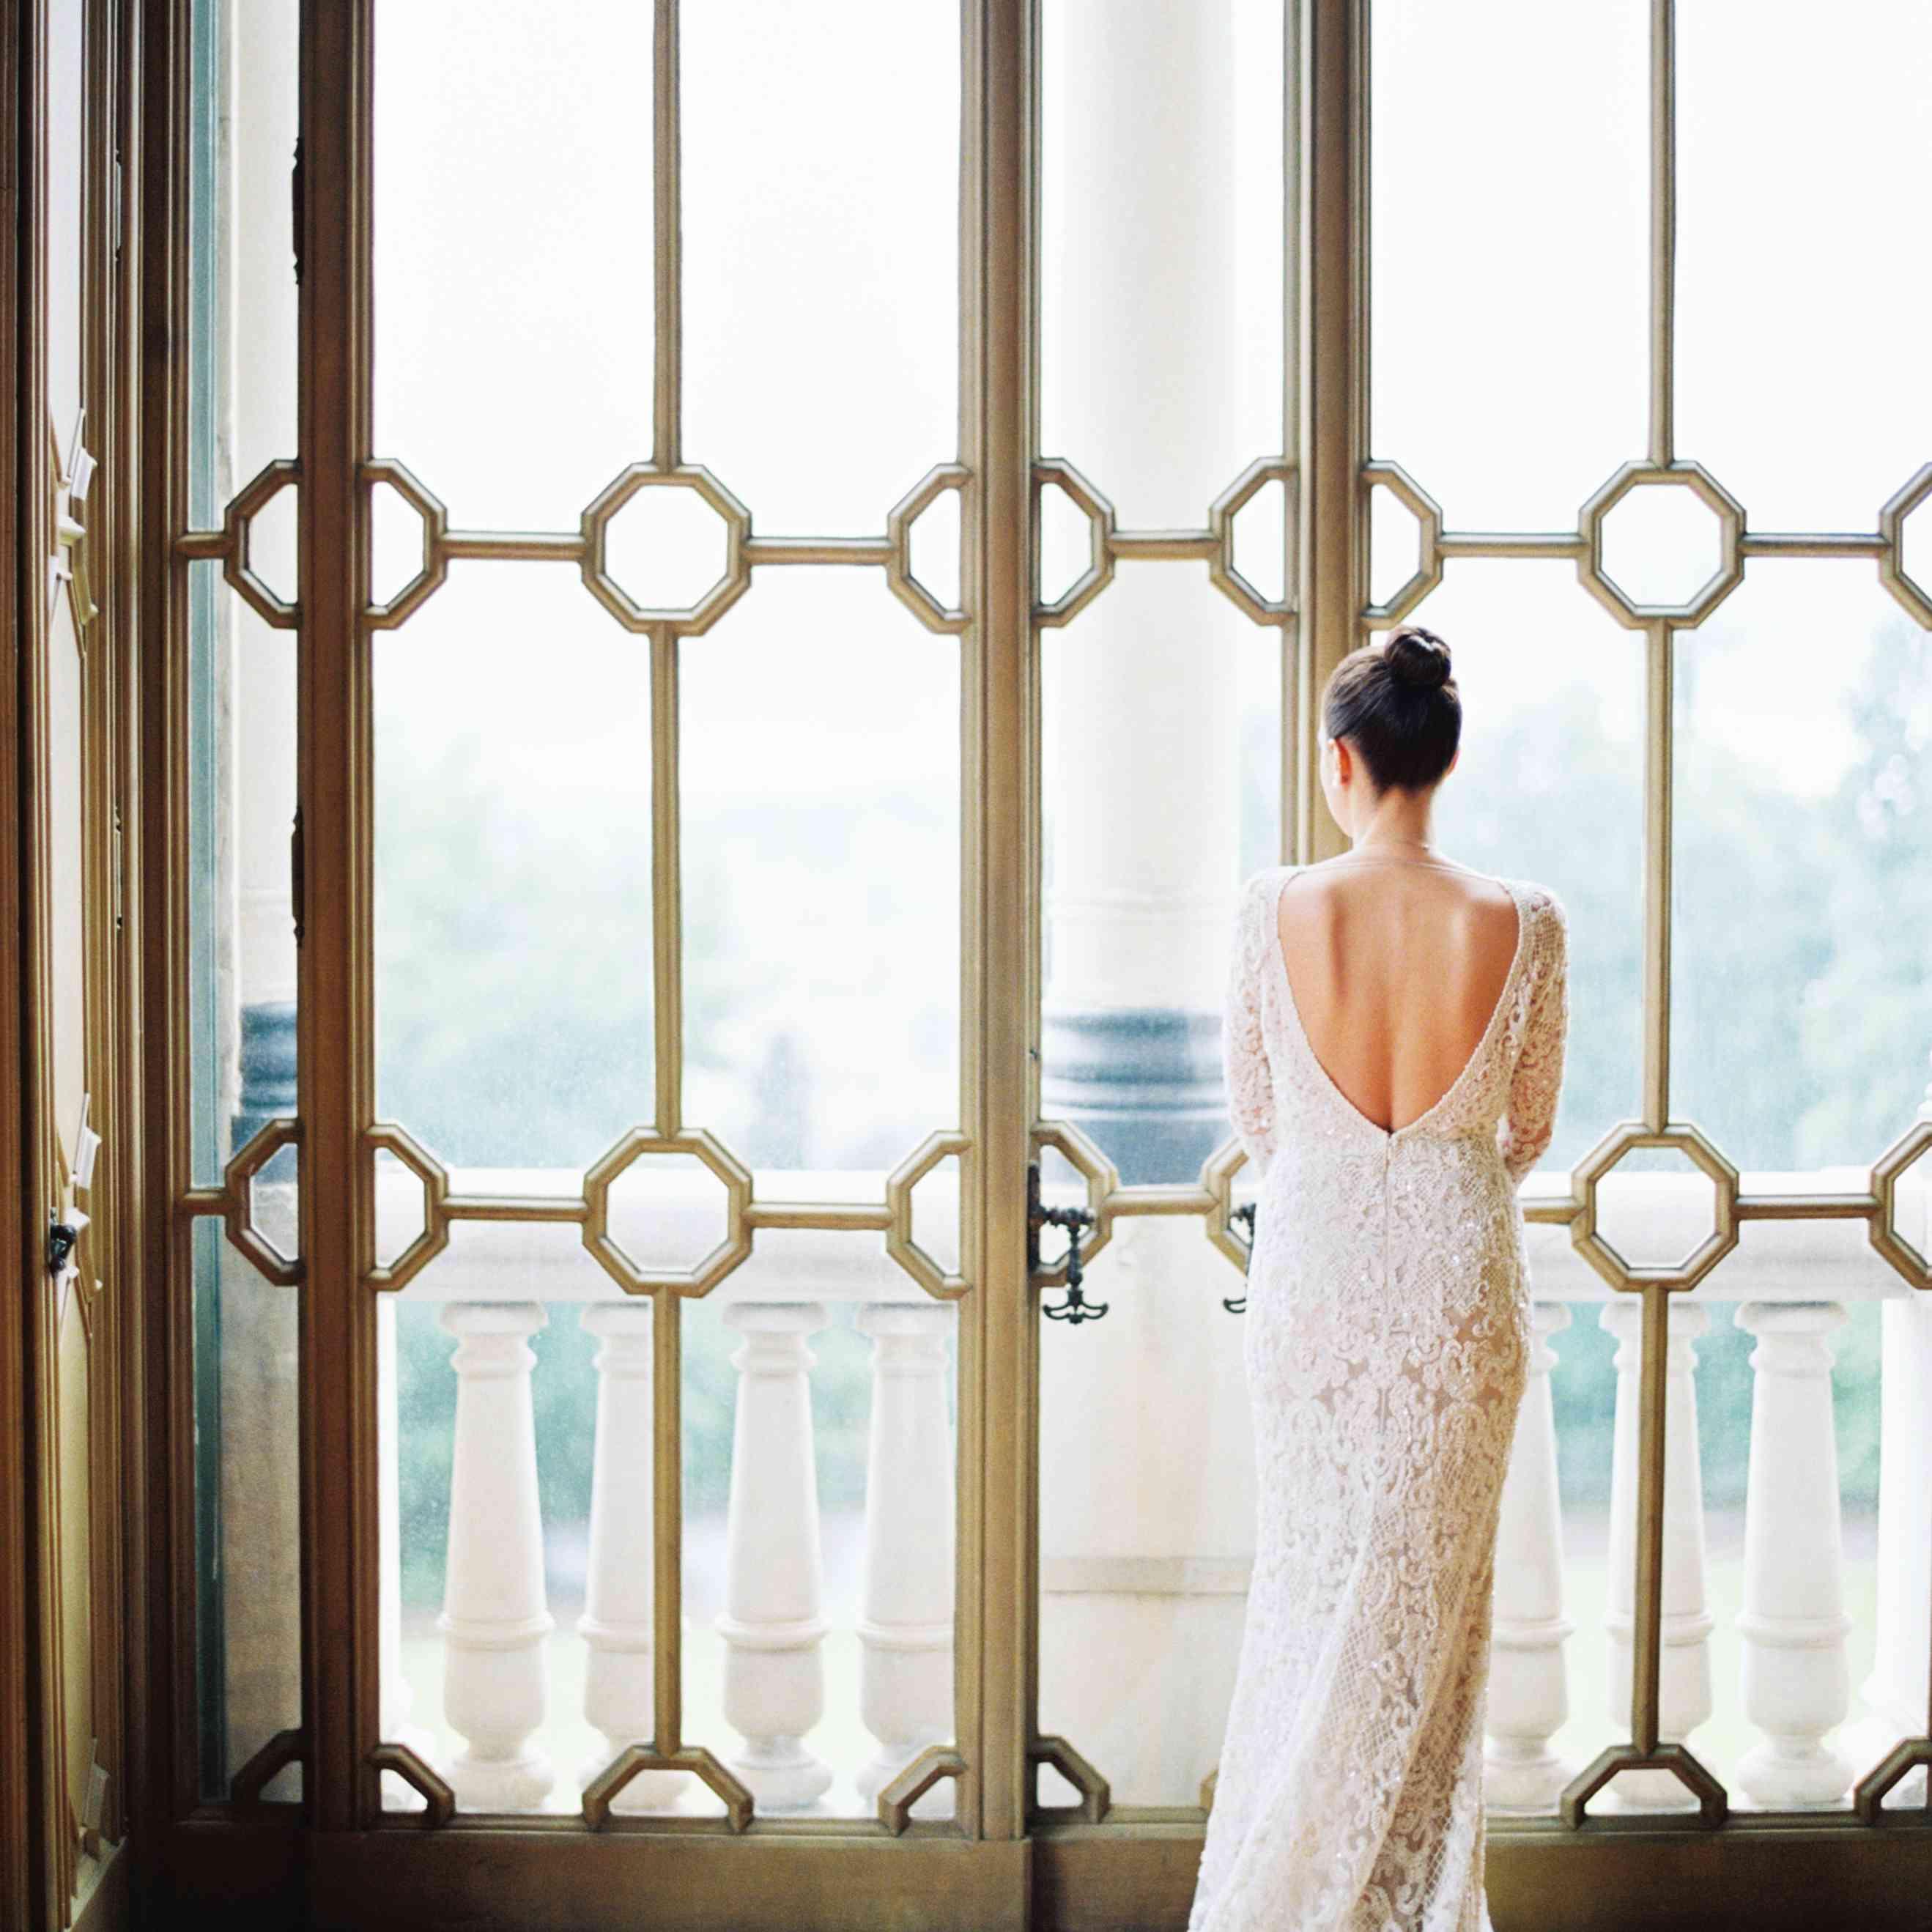 Northern Italian Wedding, Bride in Elie Saab